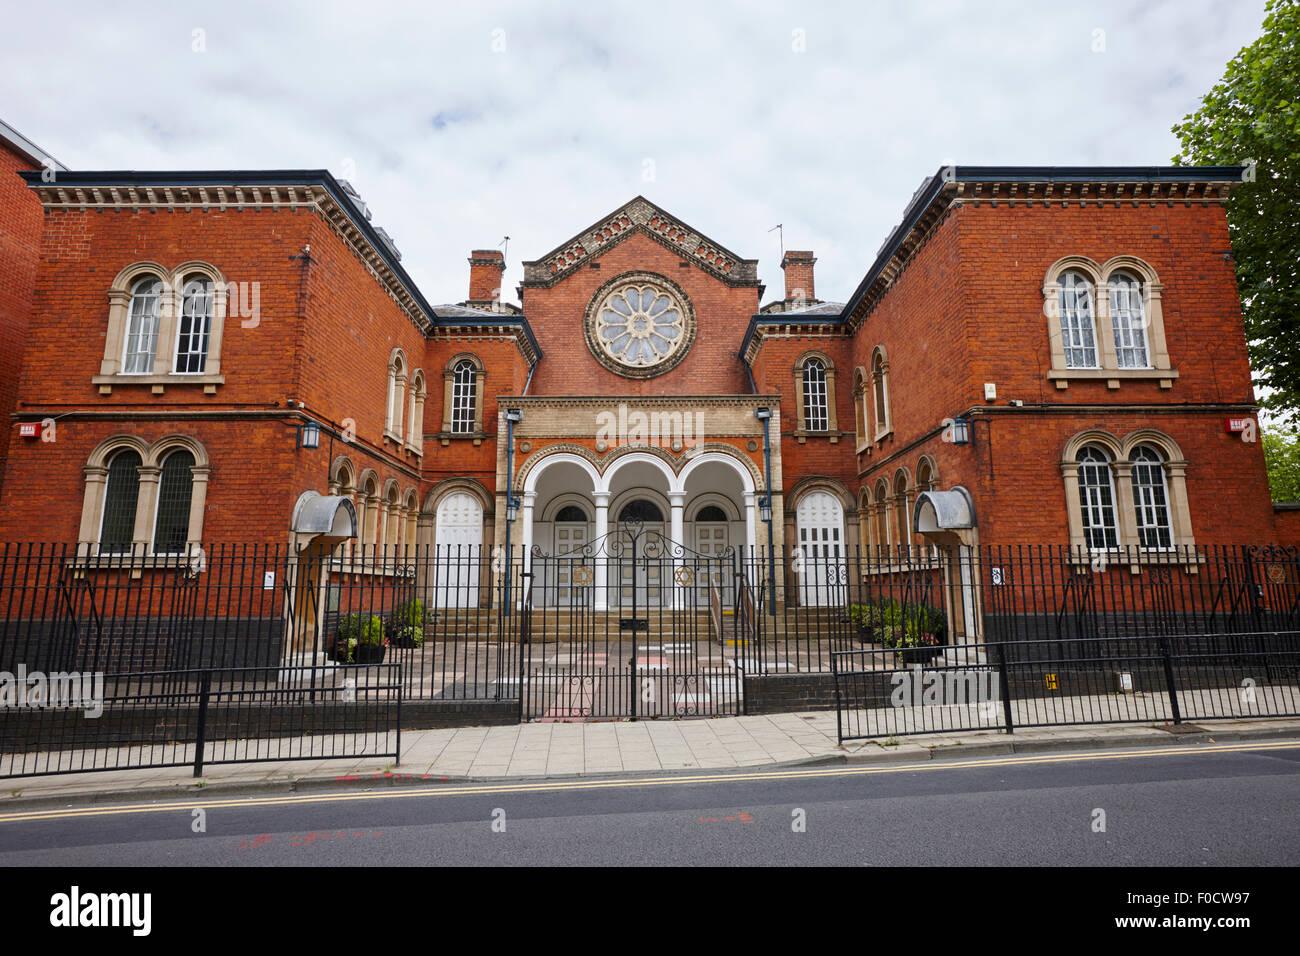 Birmingham hebrew congregation singers hill synagogue UK - Stock Image